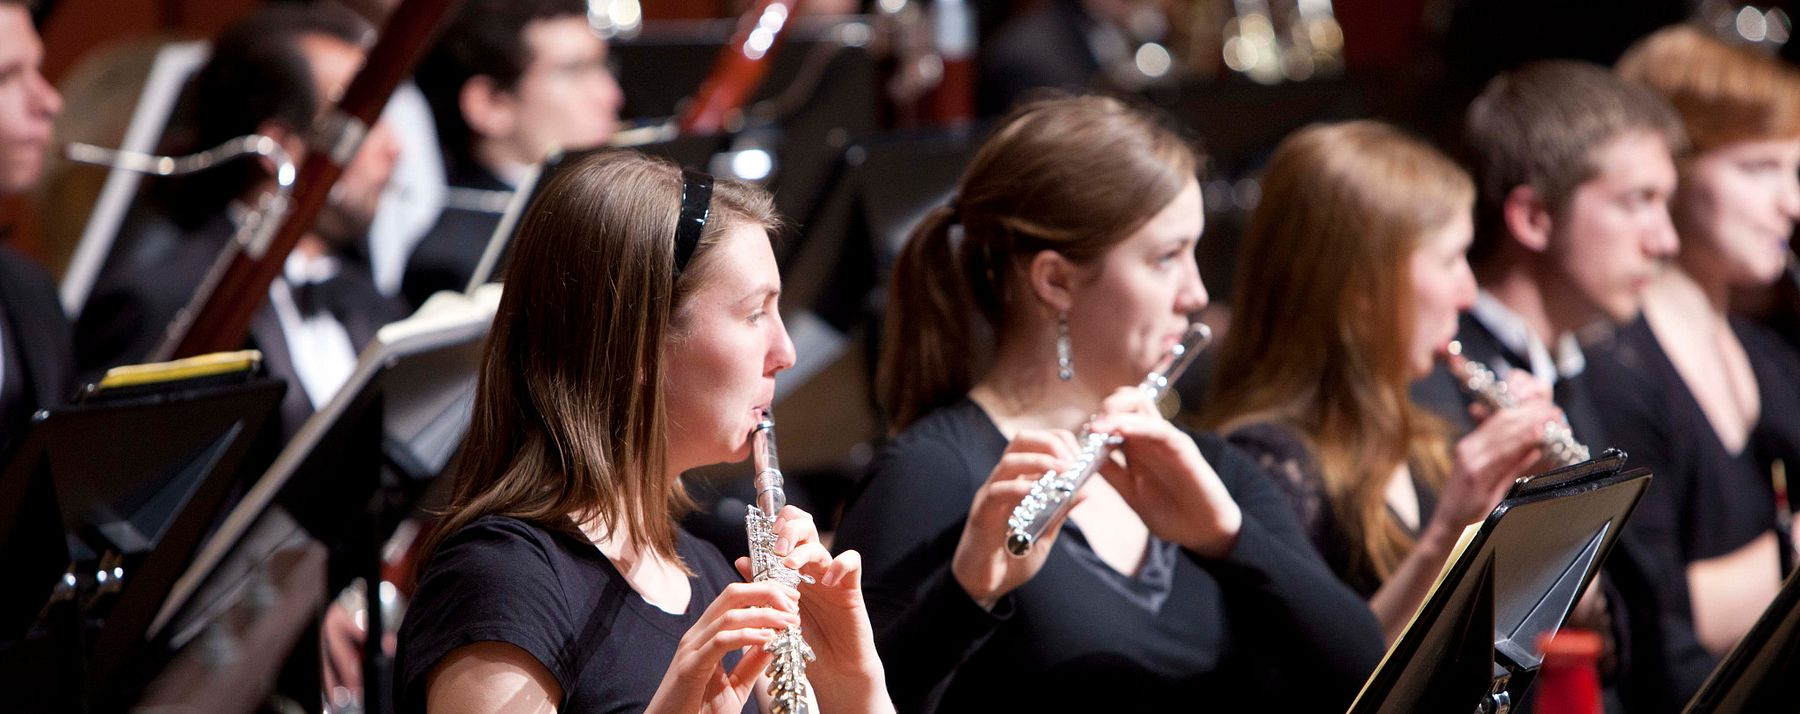 flute performance at Lamont